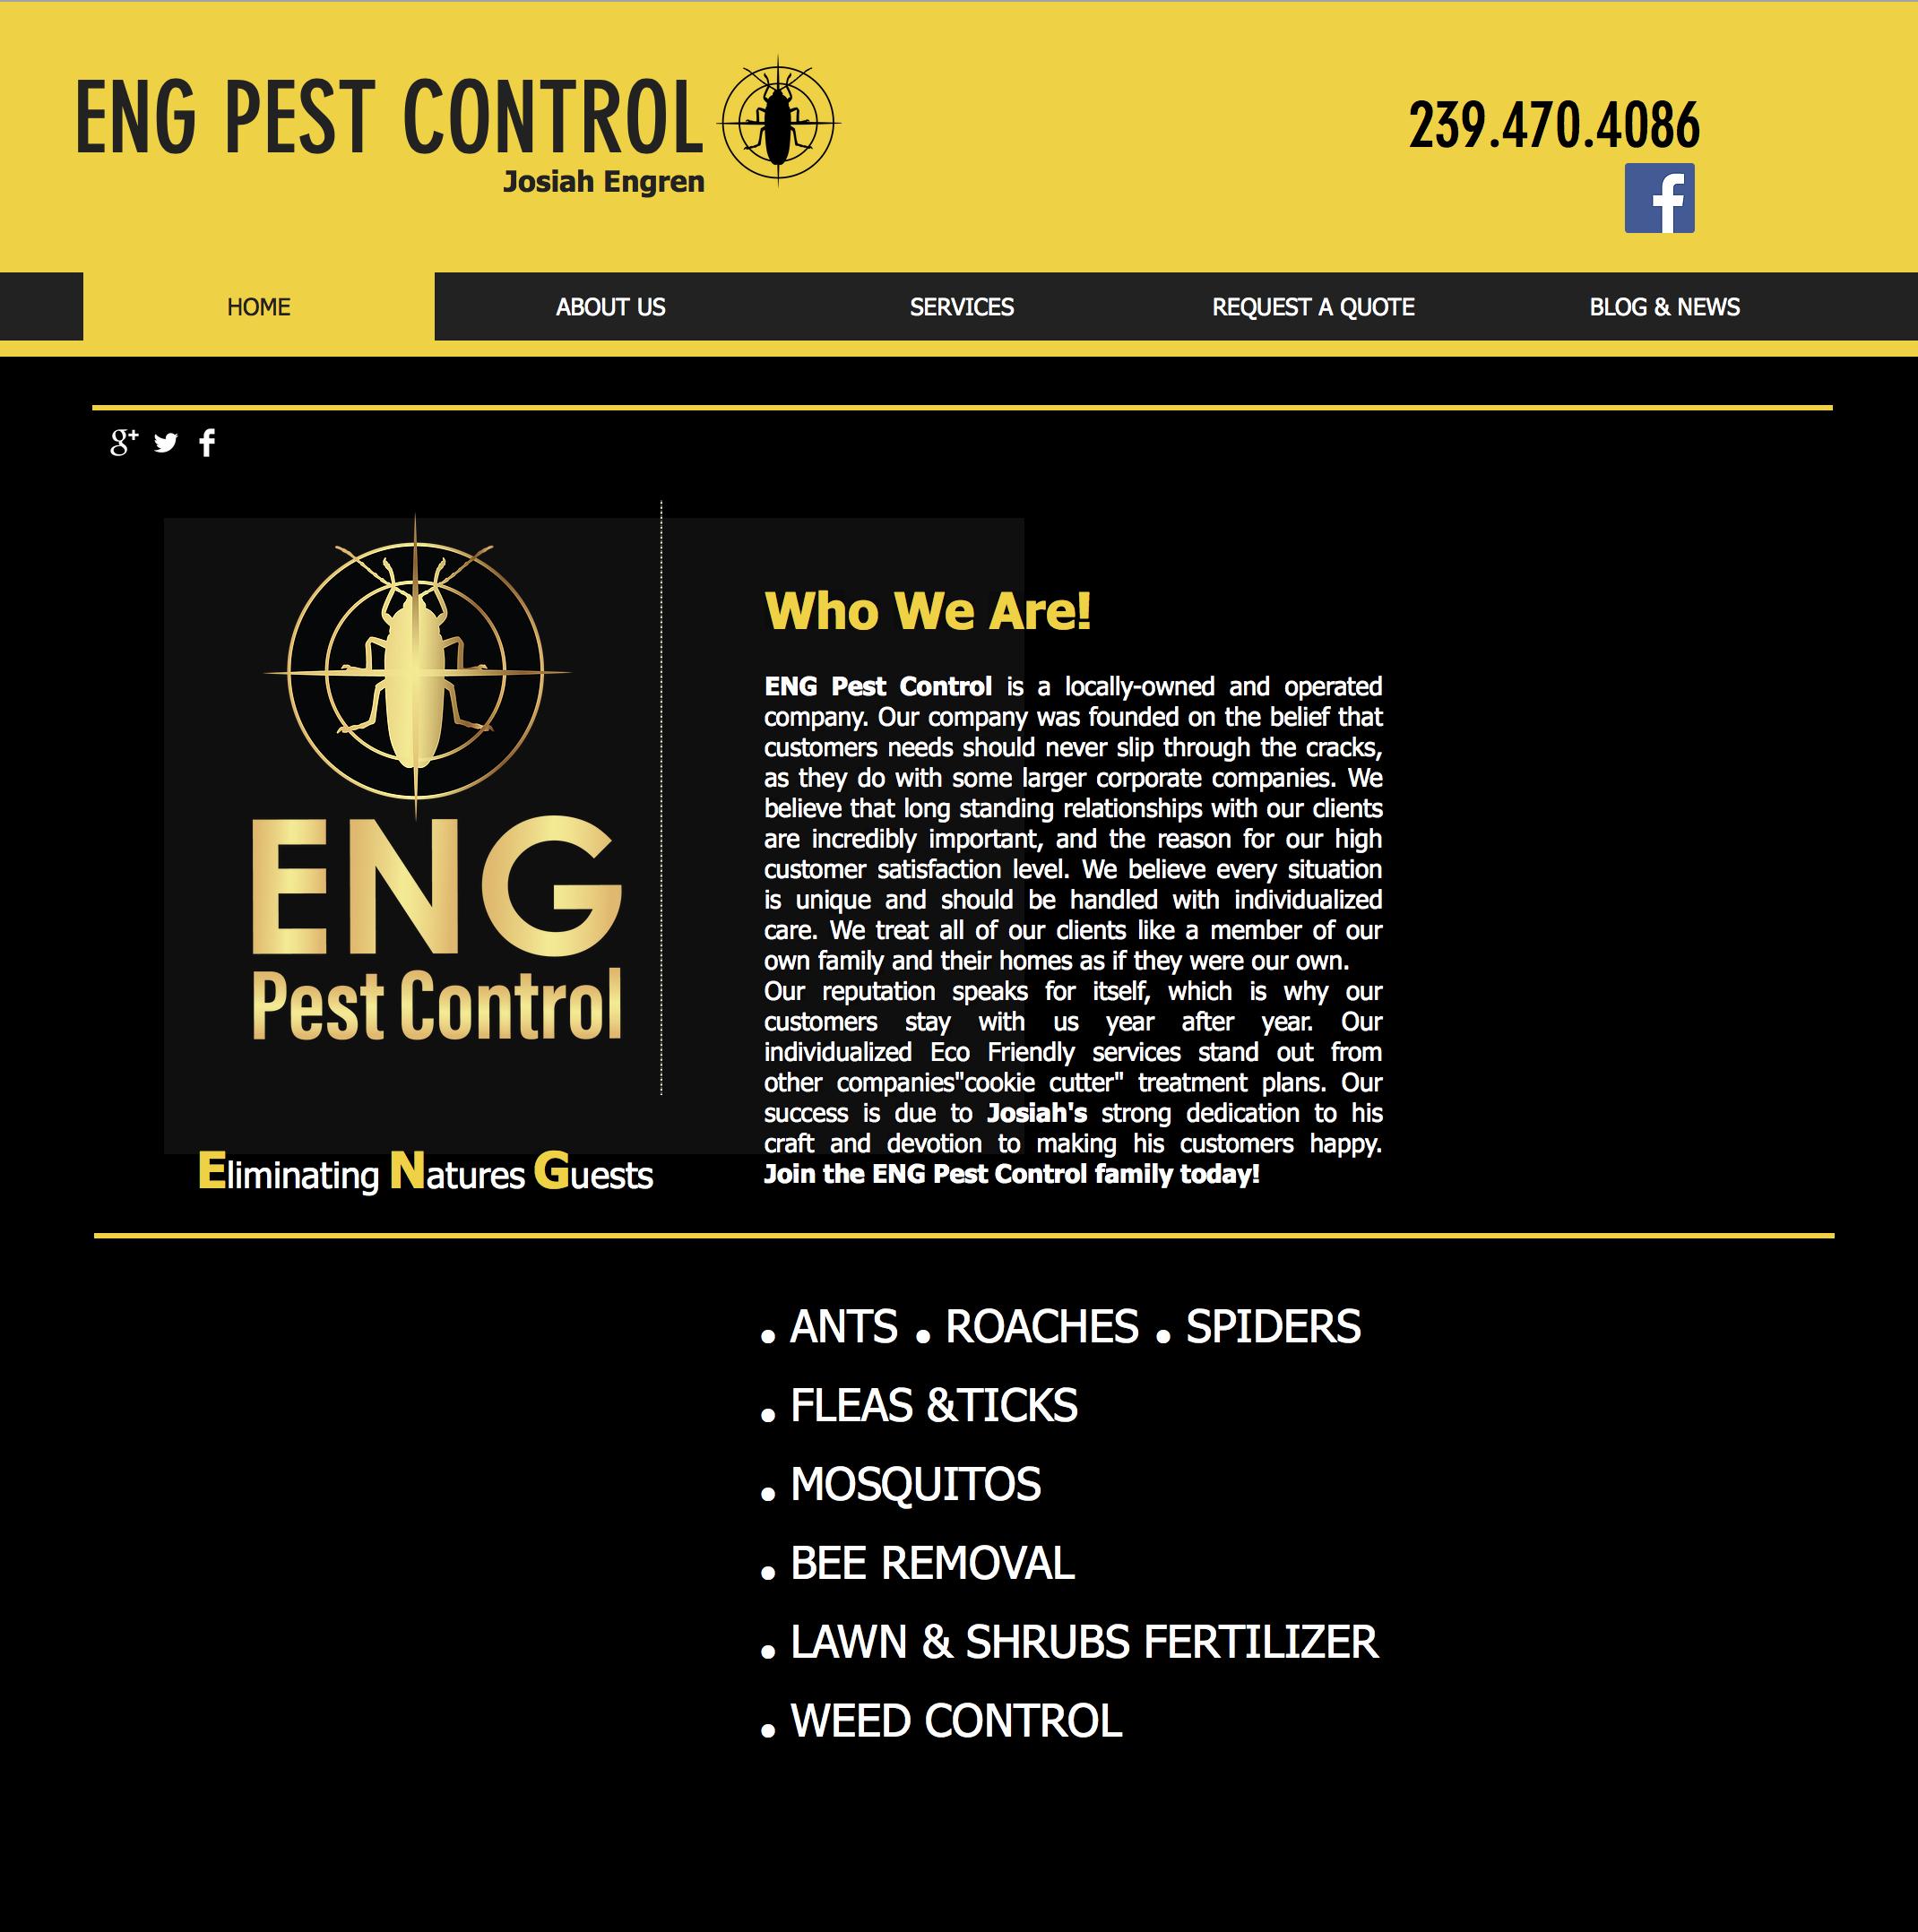 ENG Pest Control